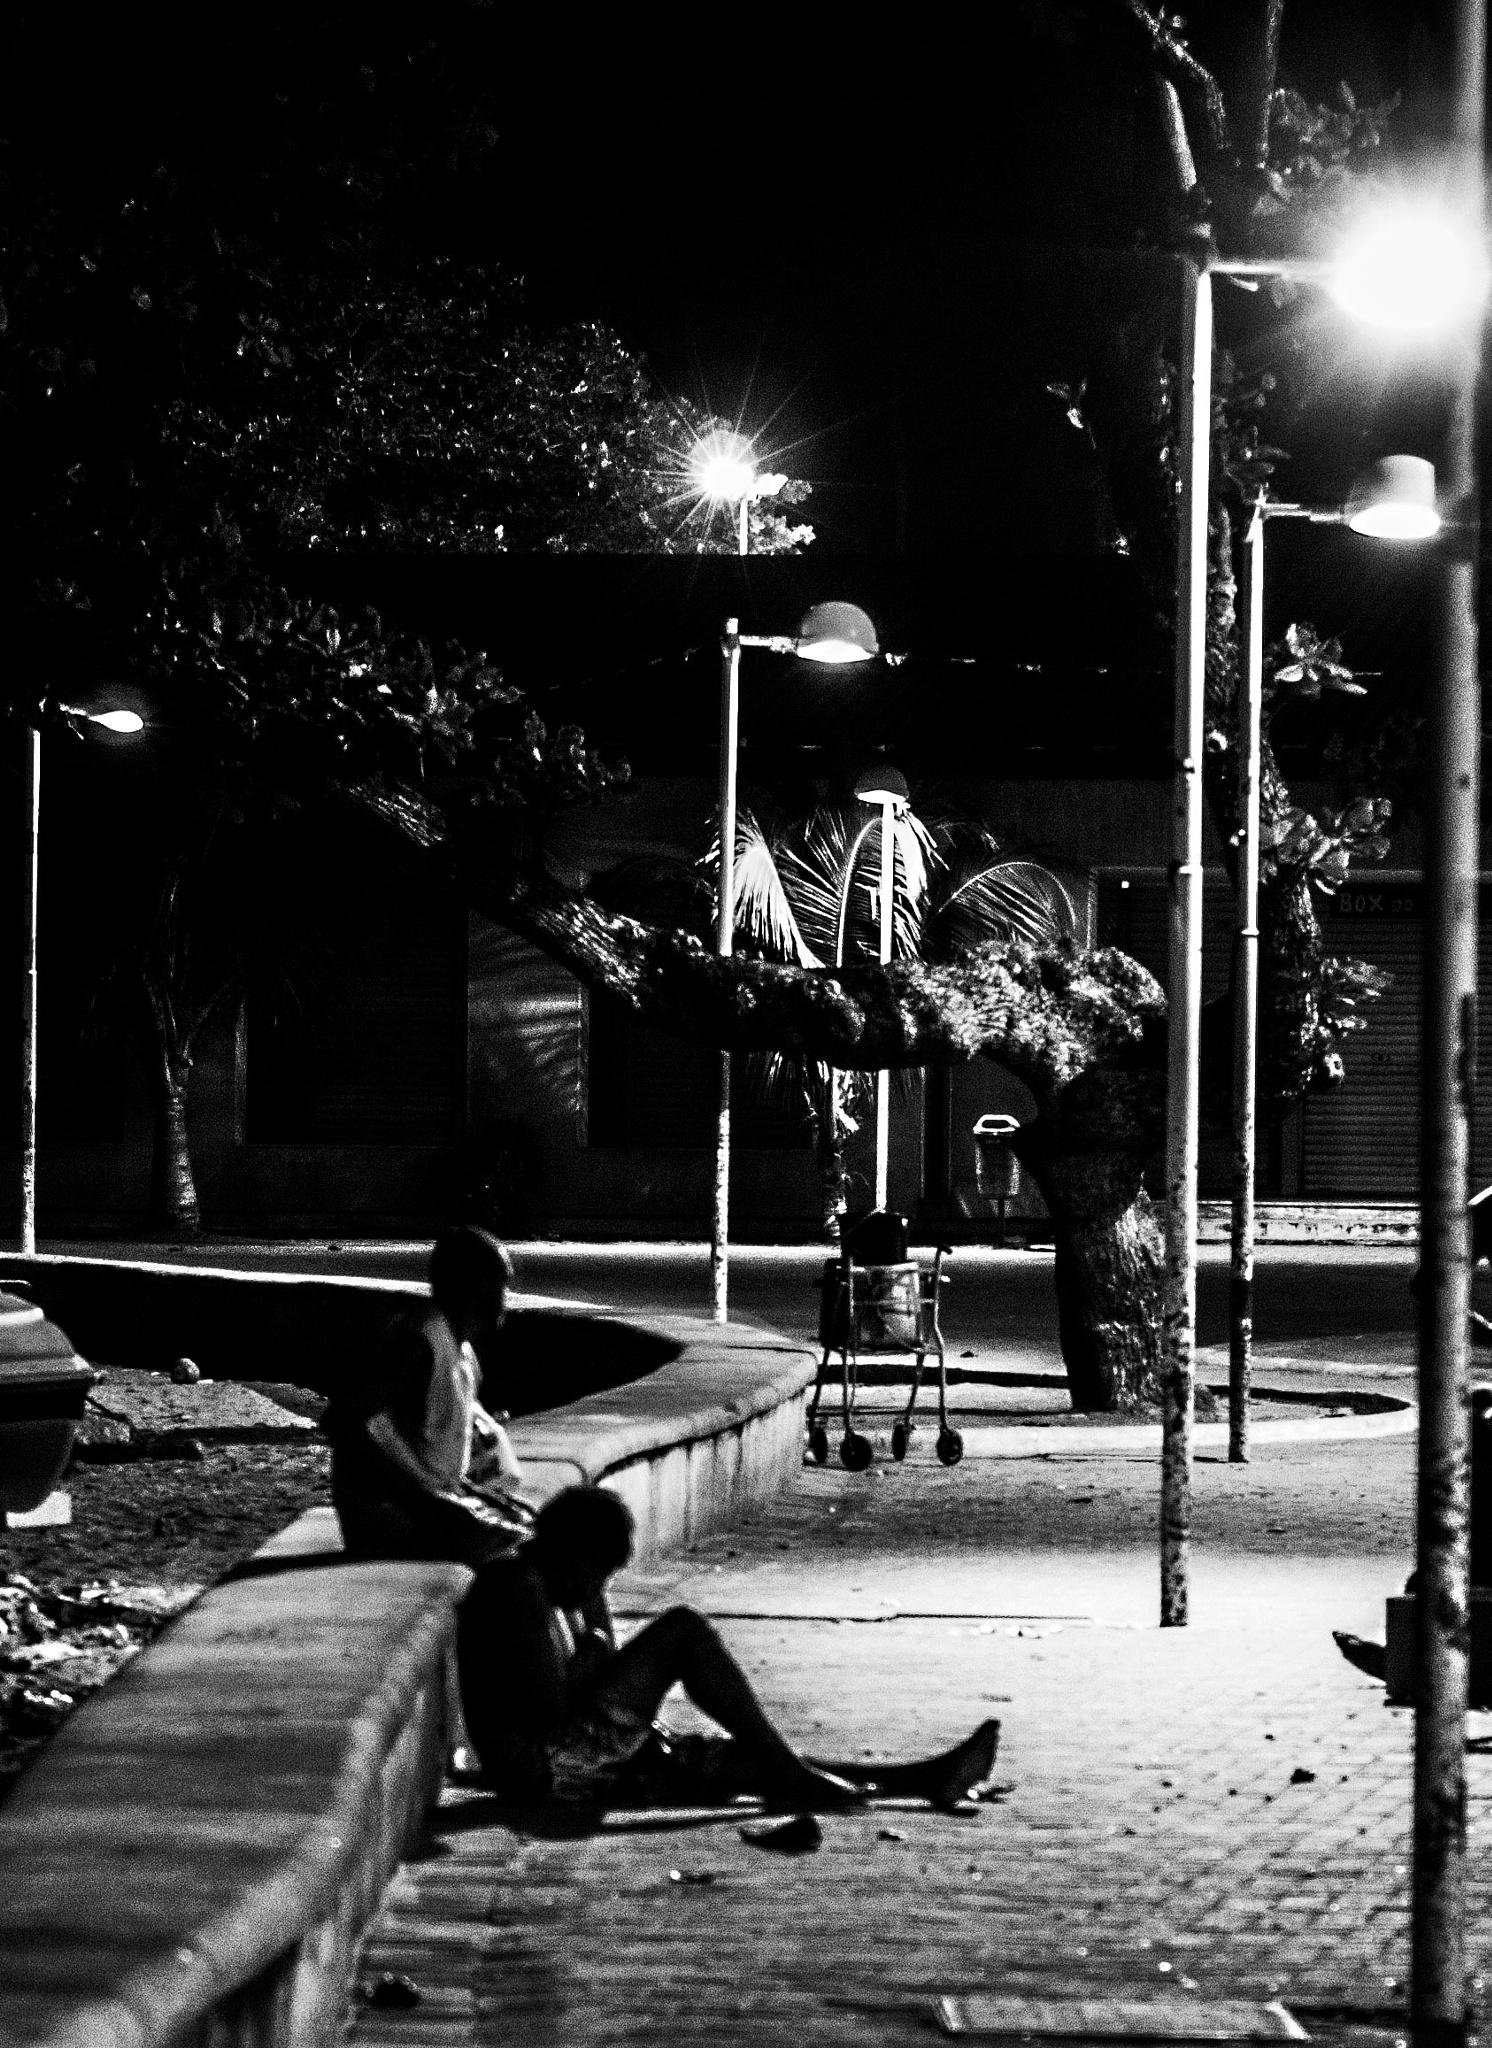 Walking deads by Francisco Milhorança